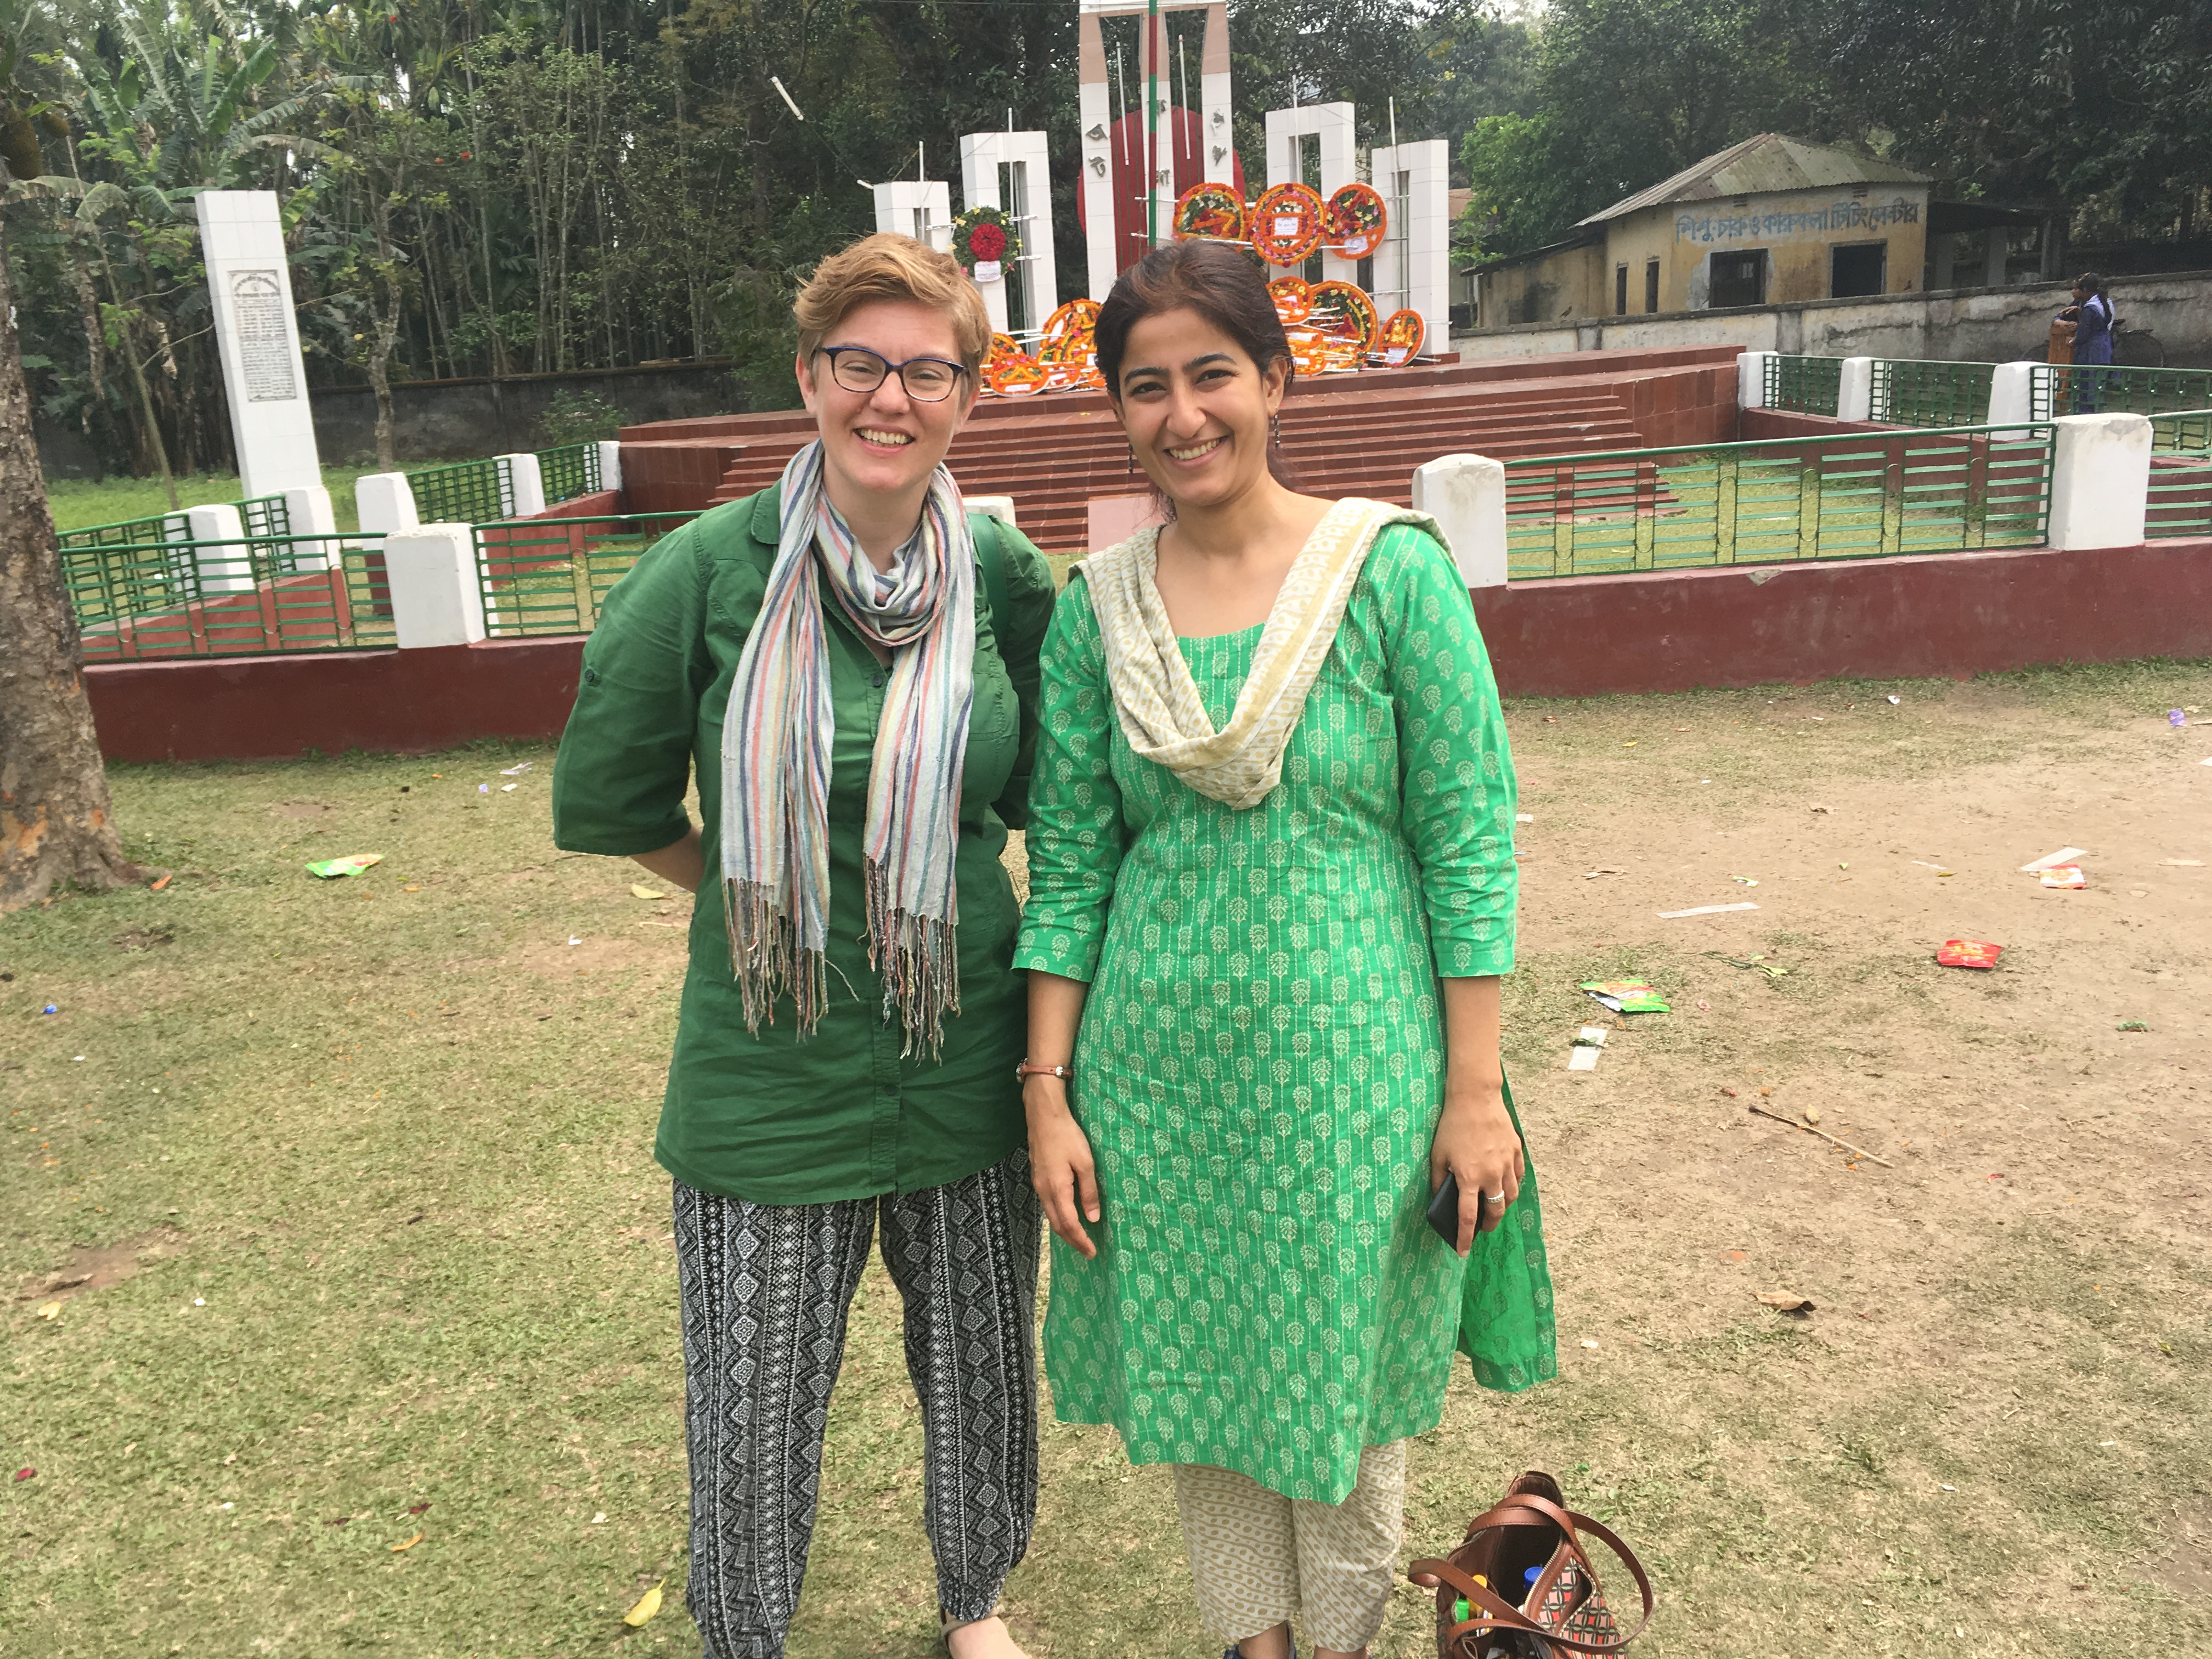 GSI's Shruti Sharma and Laura Merrill in Bangladesh, March 2017